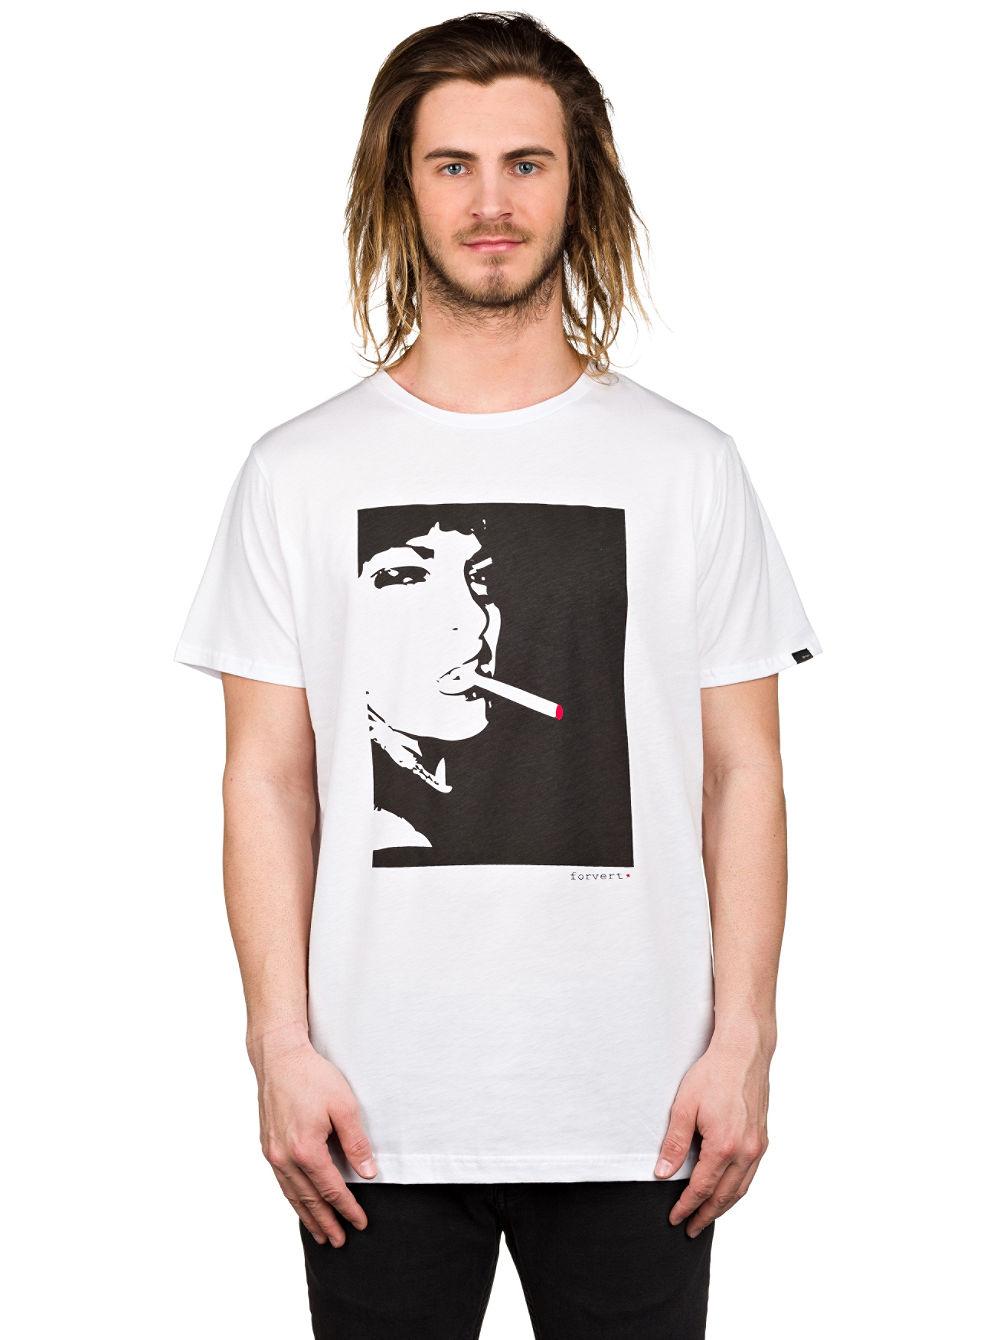 easy-leasing-t-shirt